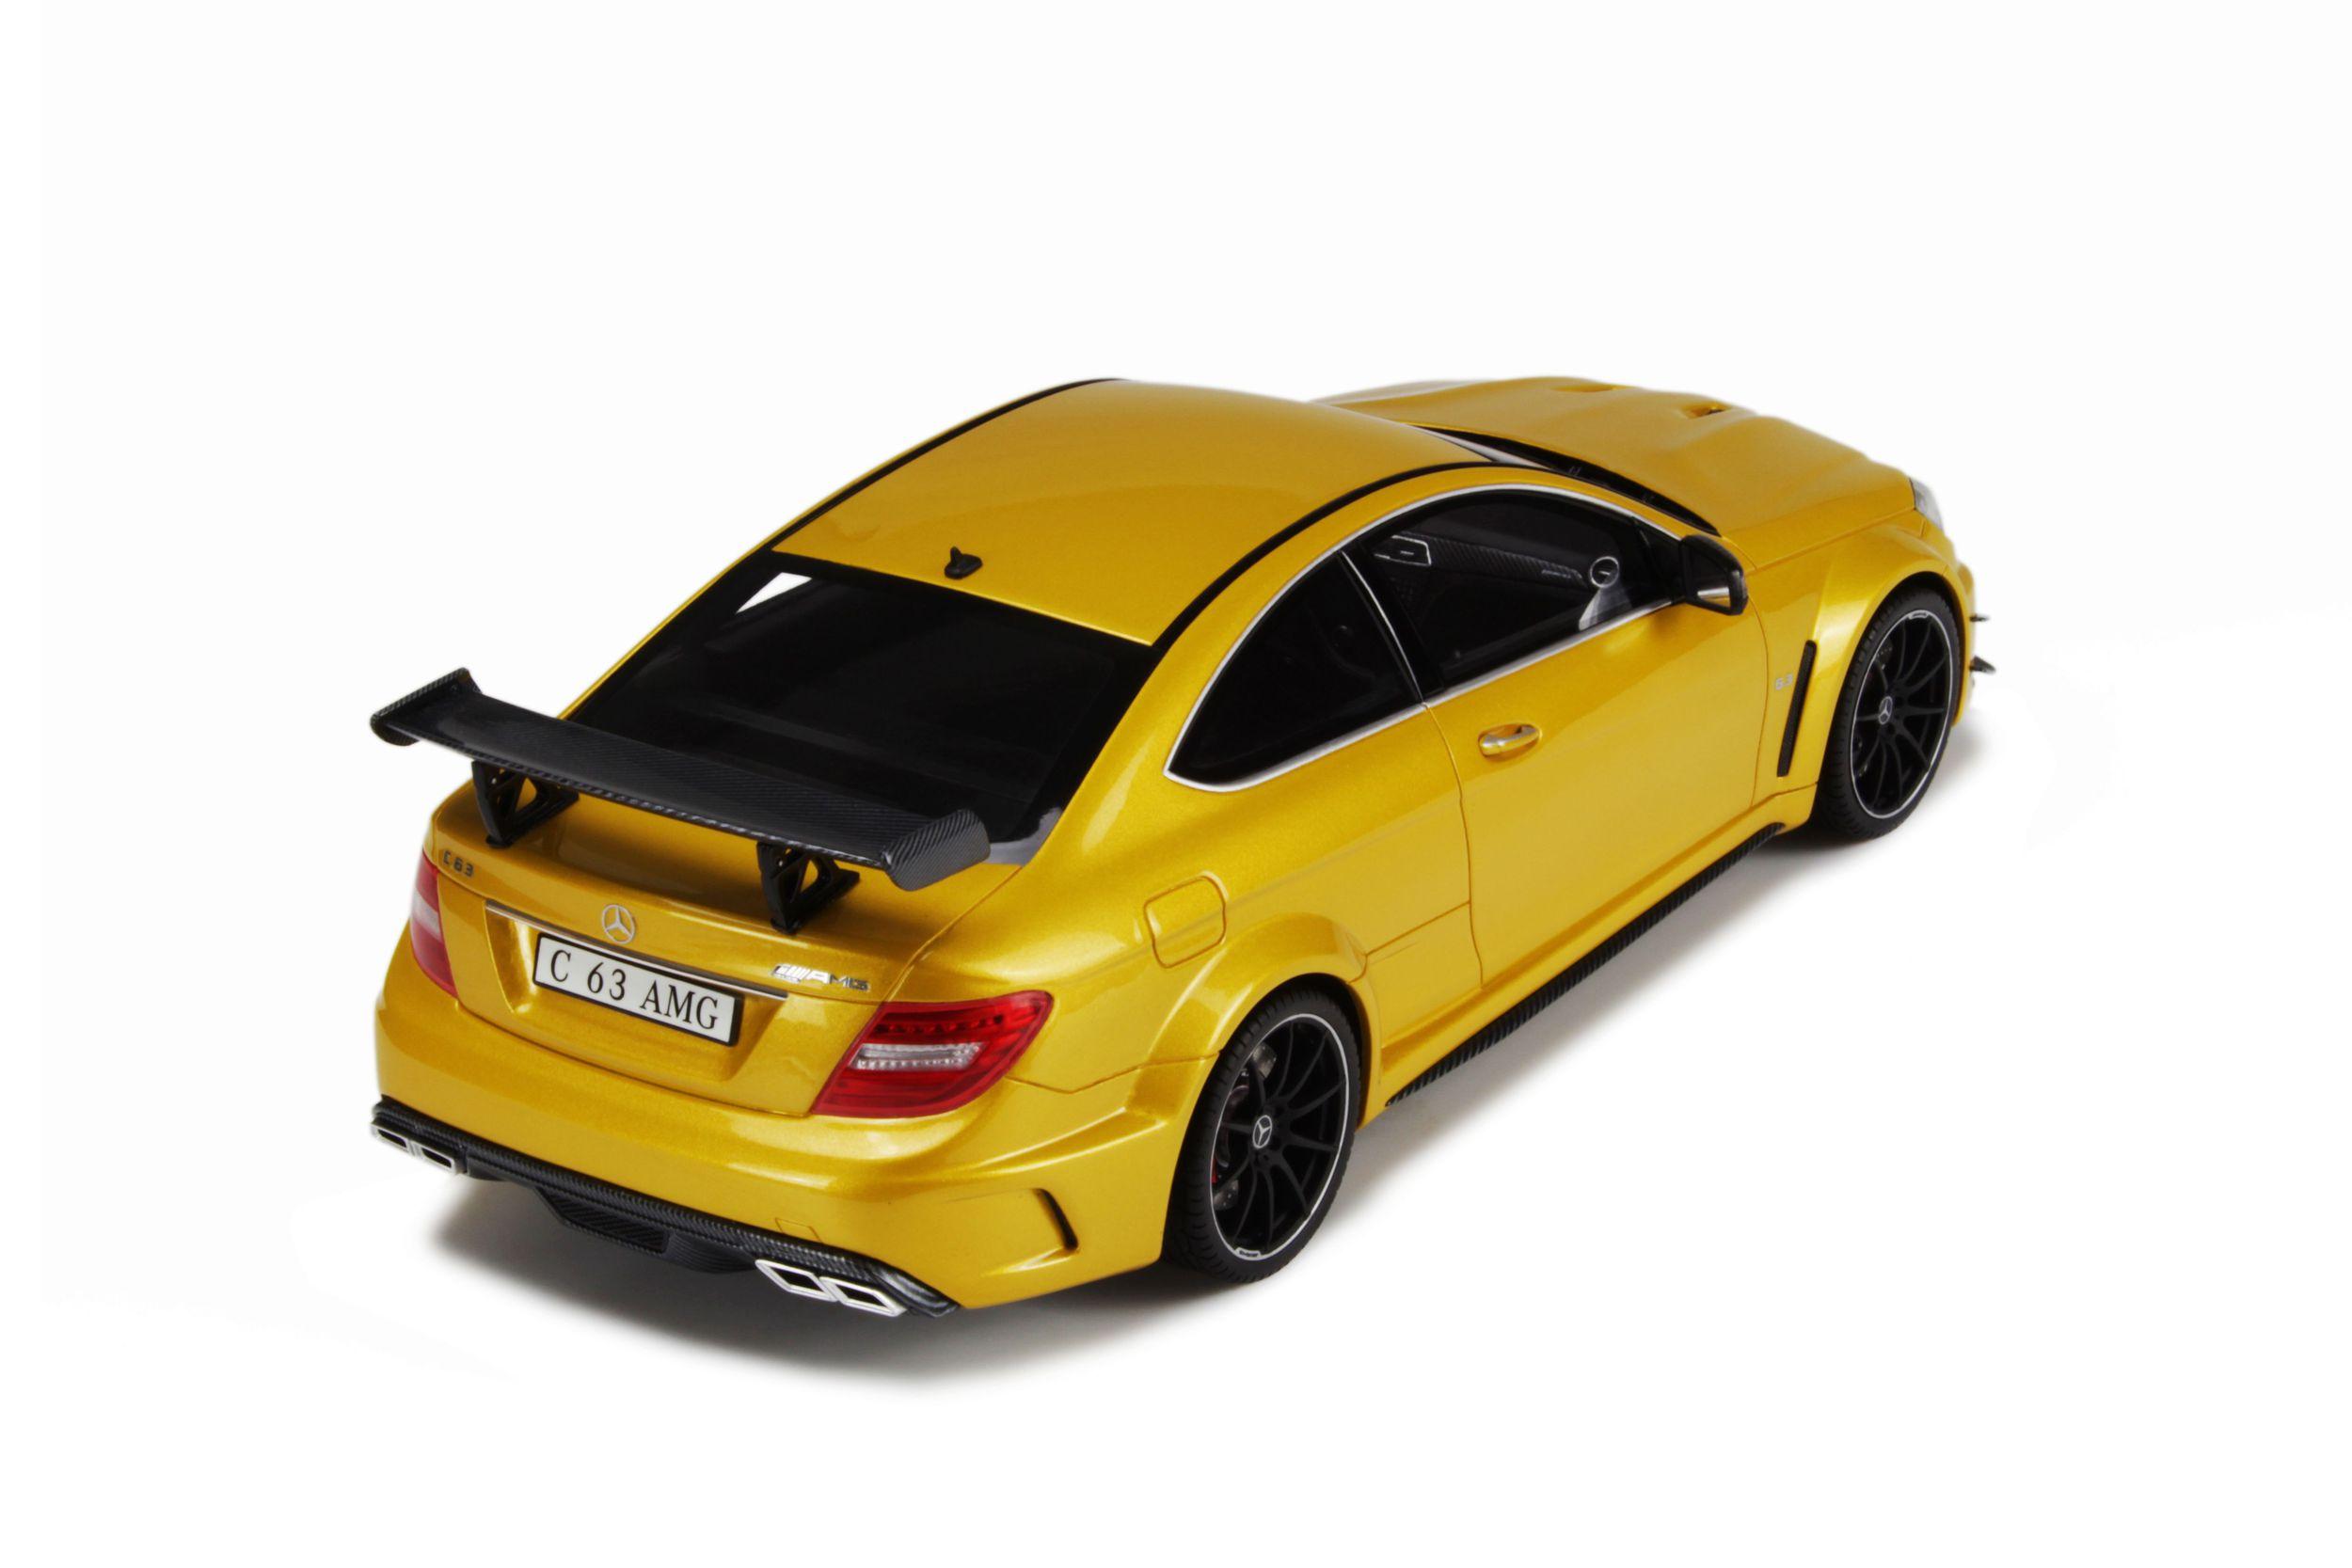 Mercedes Benz C63 AMG Black Series Model car collection